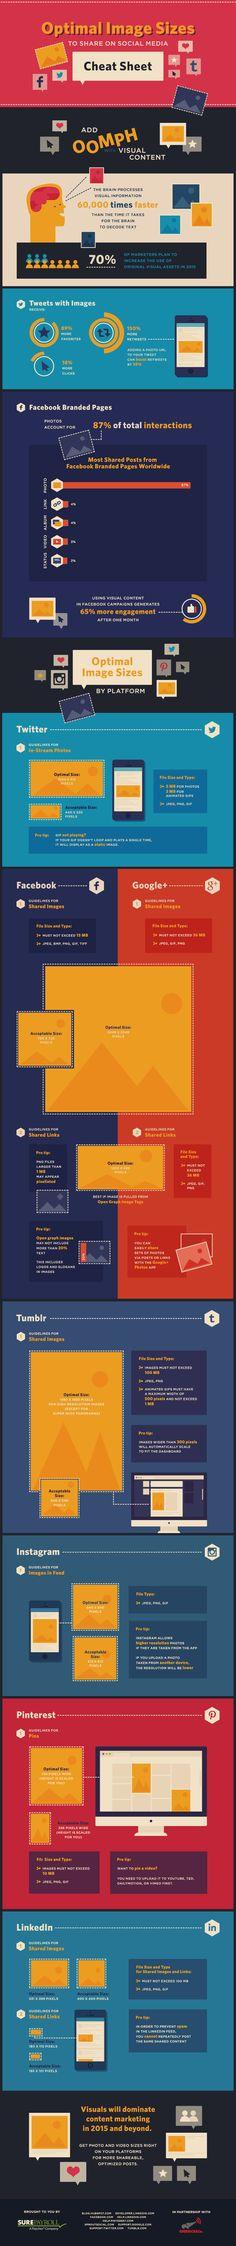 Optimal Image Sizes to Share on Social Media Cheat Sheet #infographic #SocialMedia